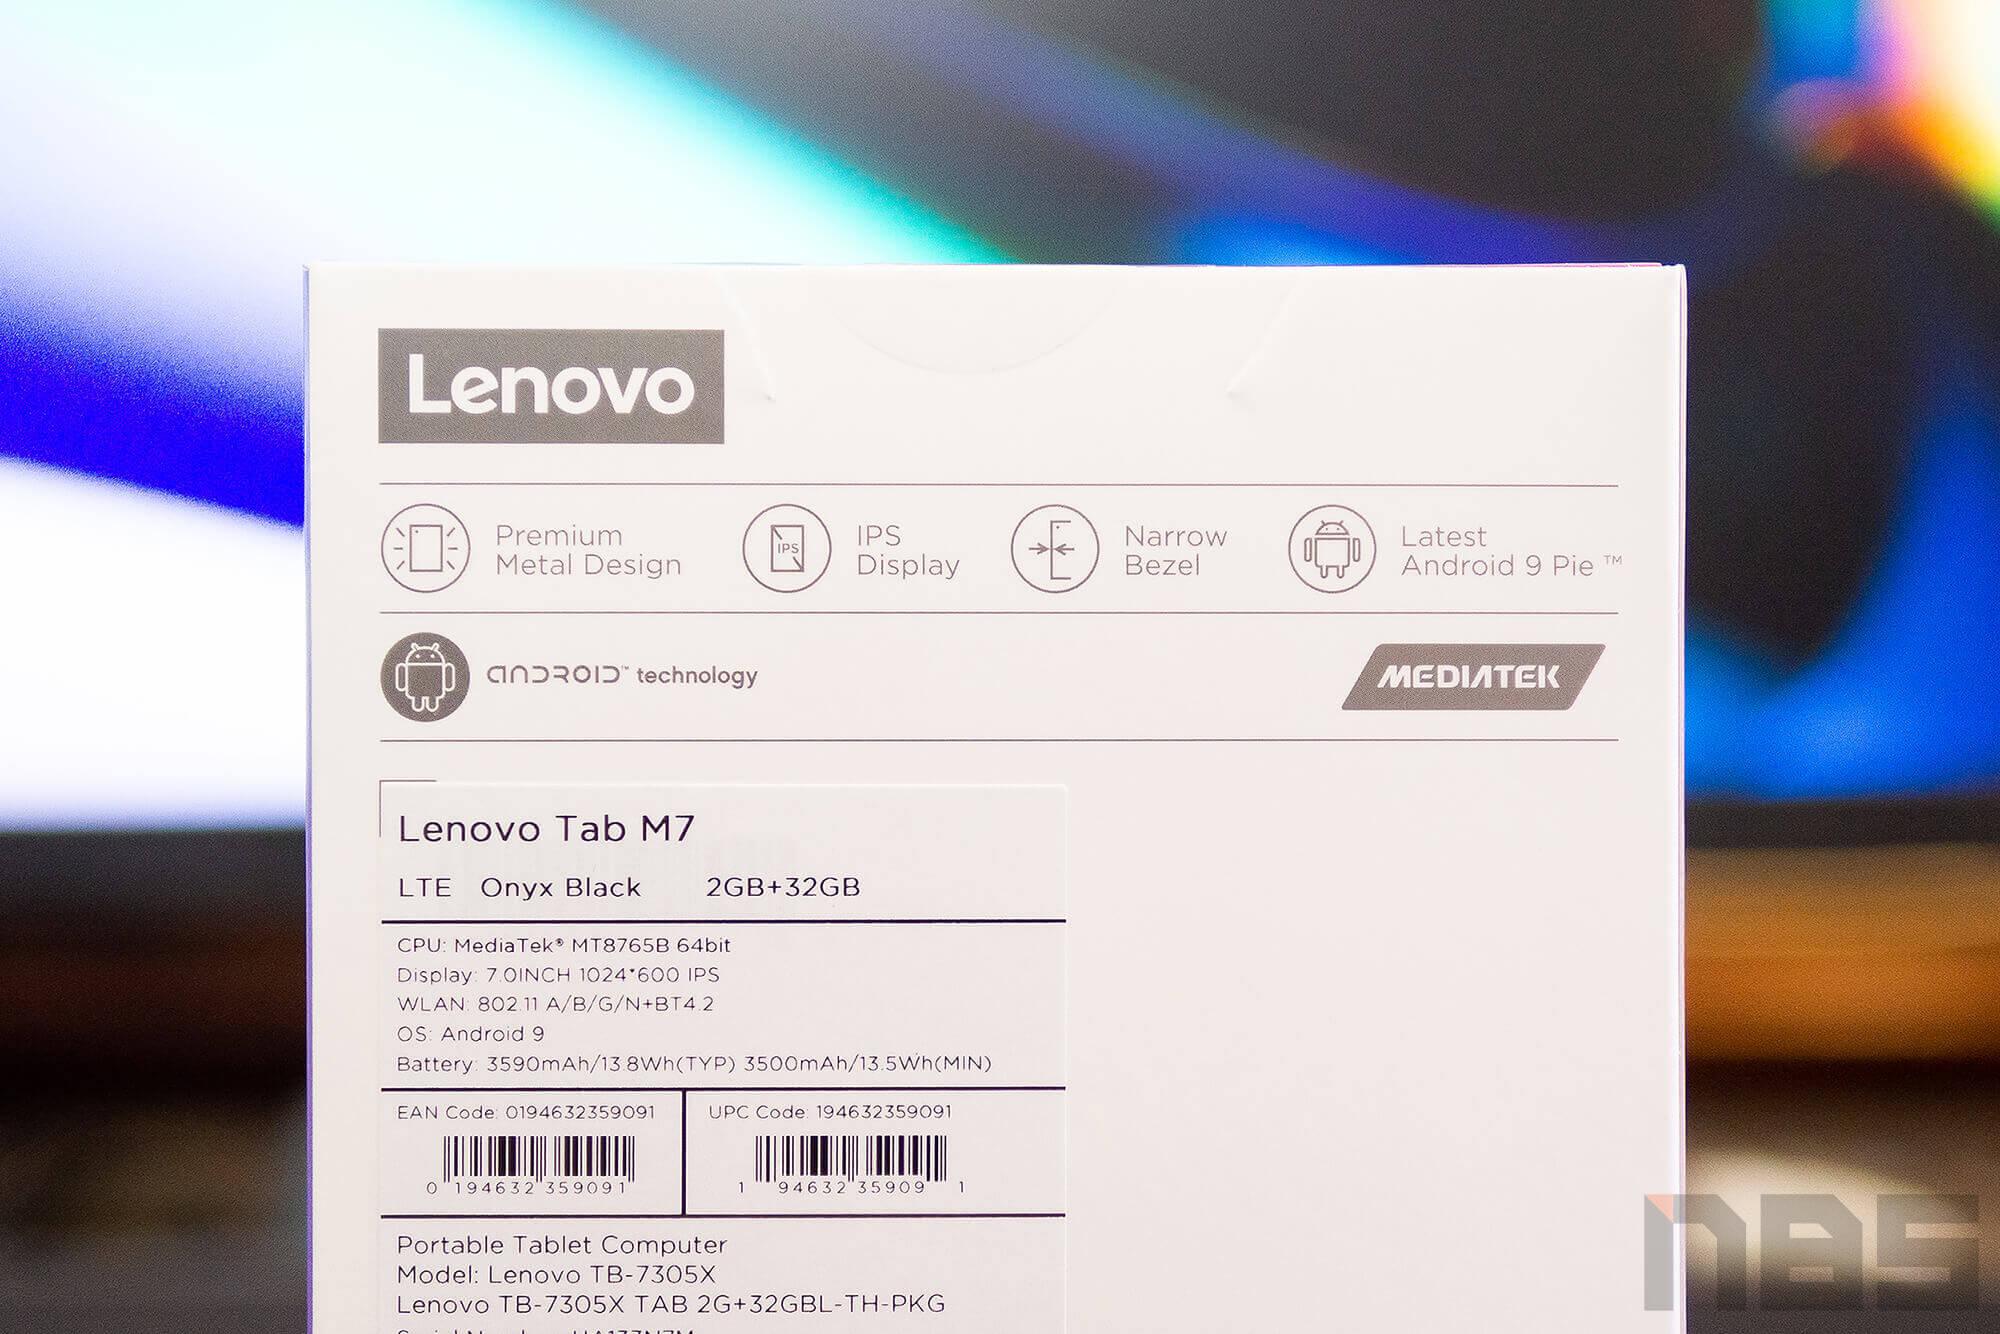 Review Lenovo Tab M7 NotebookSPEC 3